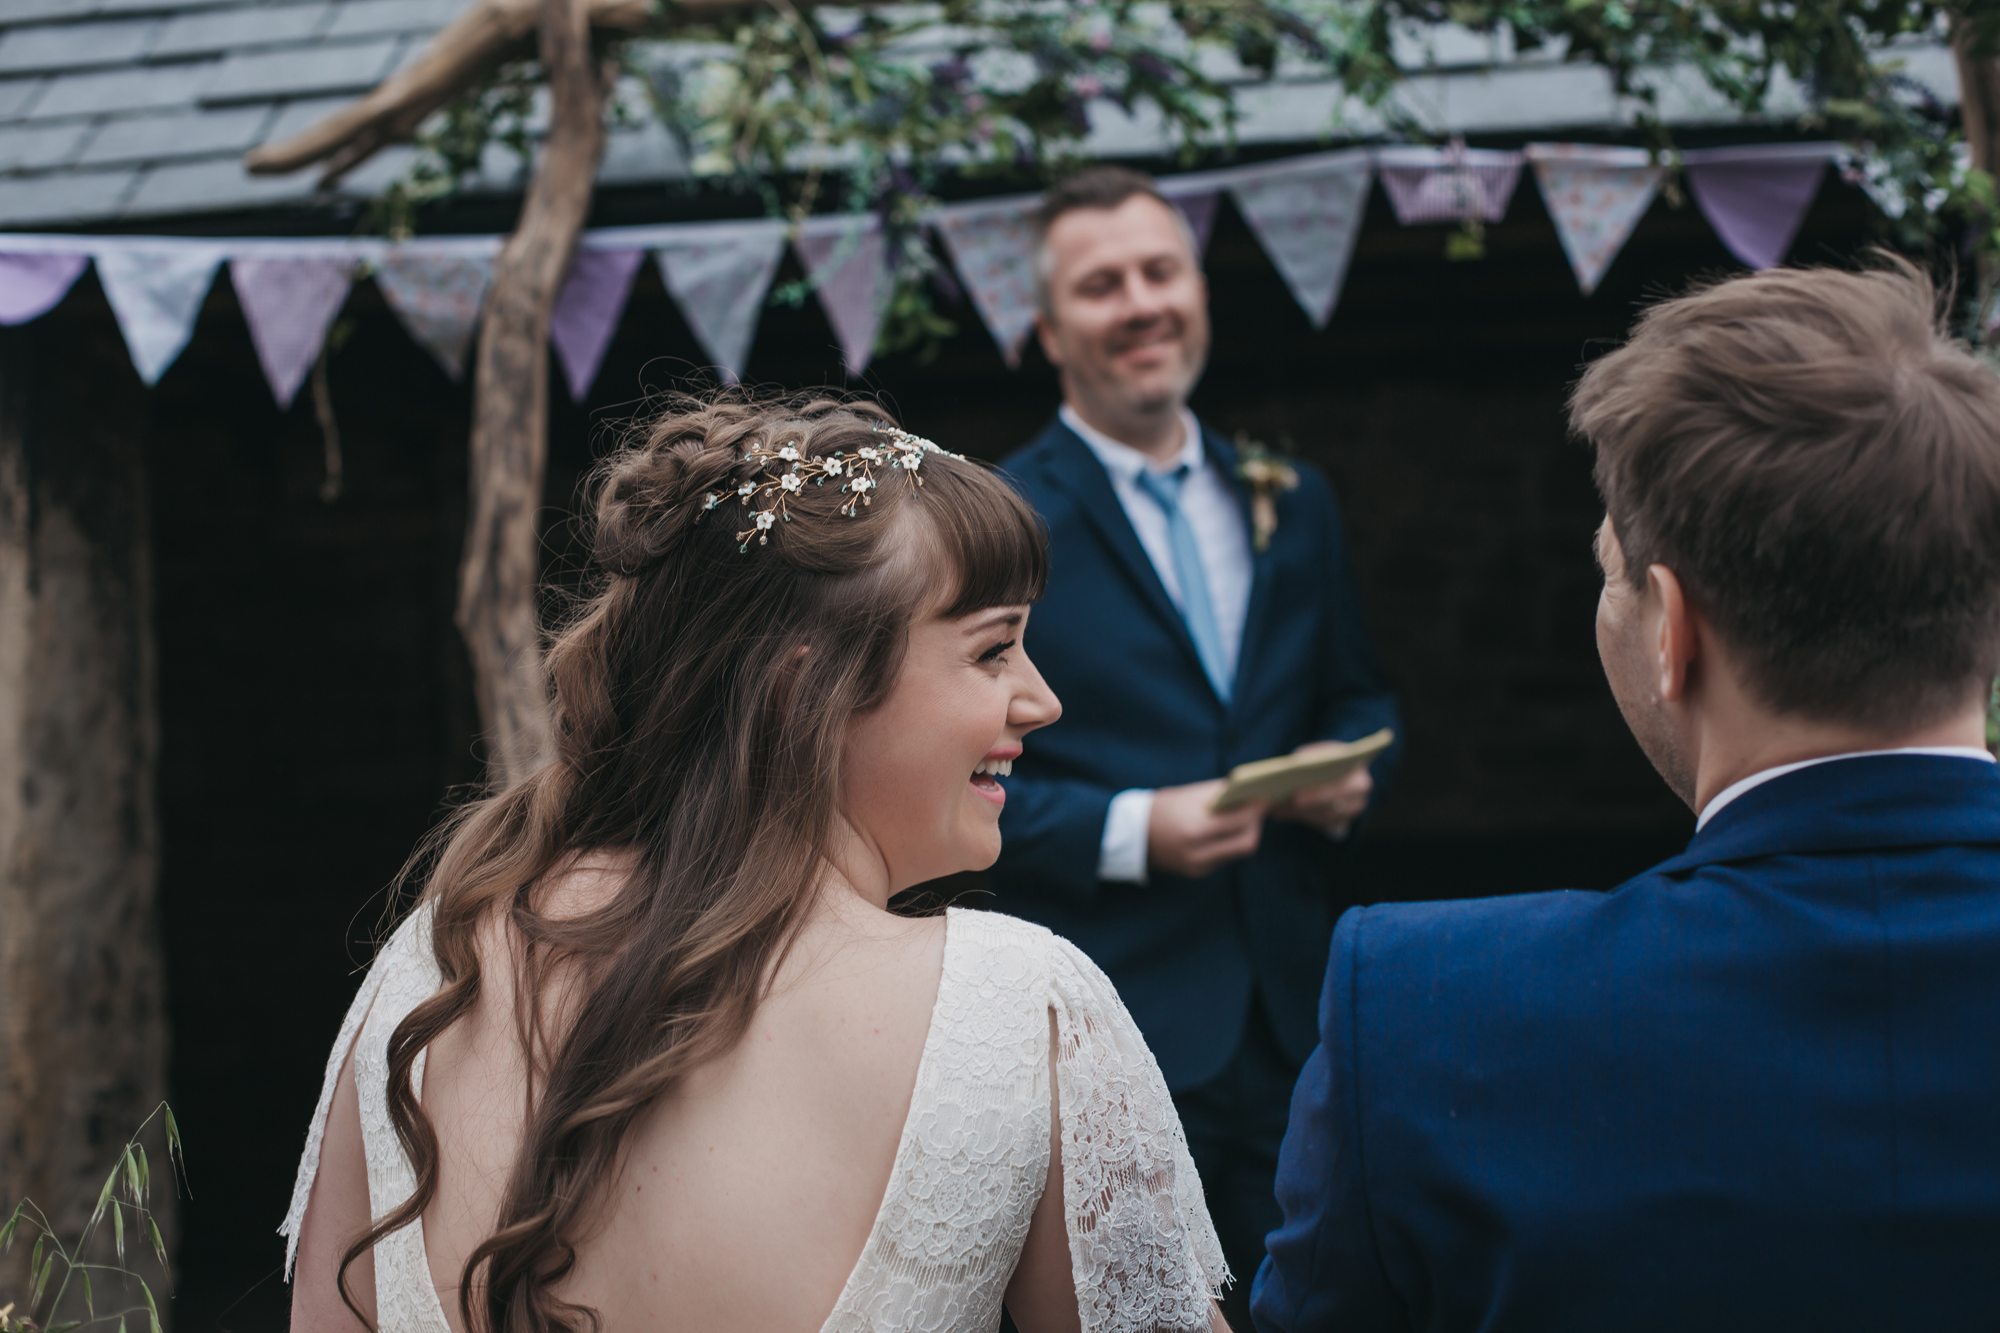 Kristy-Back-Garden-Outdoor-Wedding-Sheffield-Industrial-Warehouse-Wedding-Bohemian-Kate-Beaumont-Dahlia-Dress-12.jpg